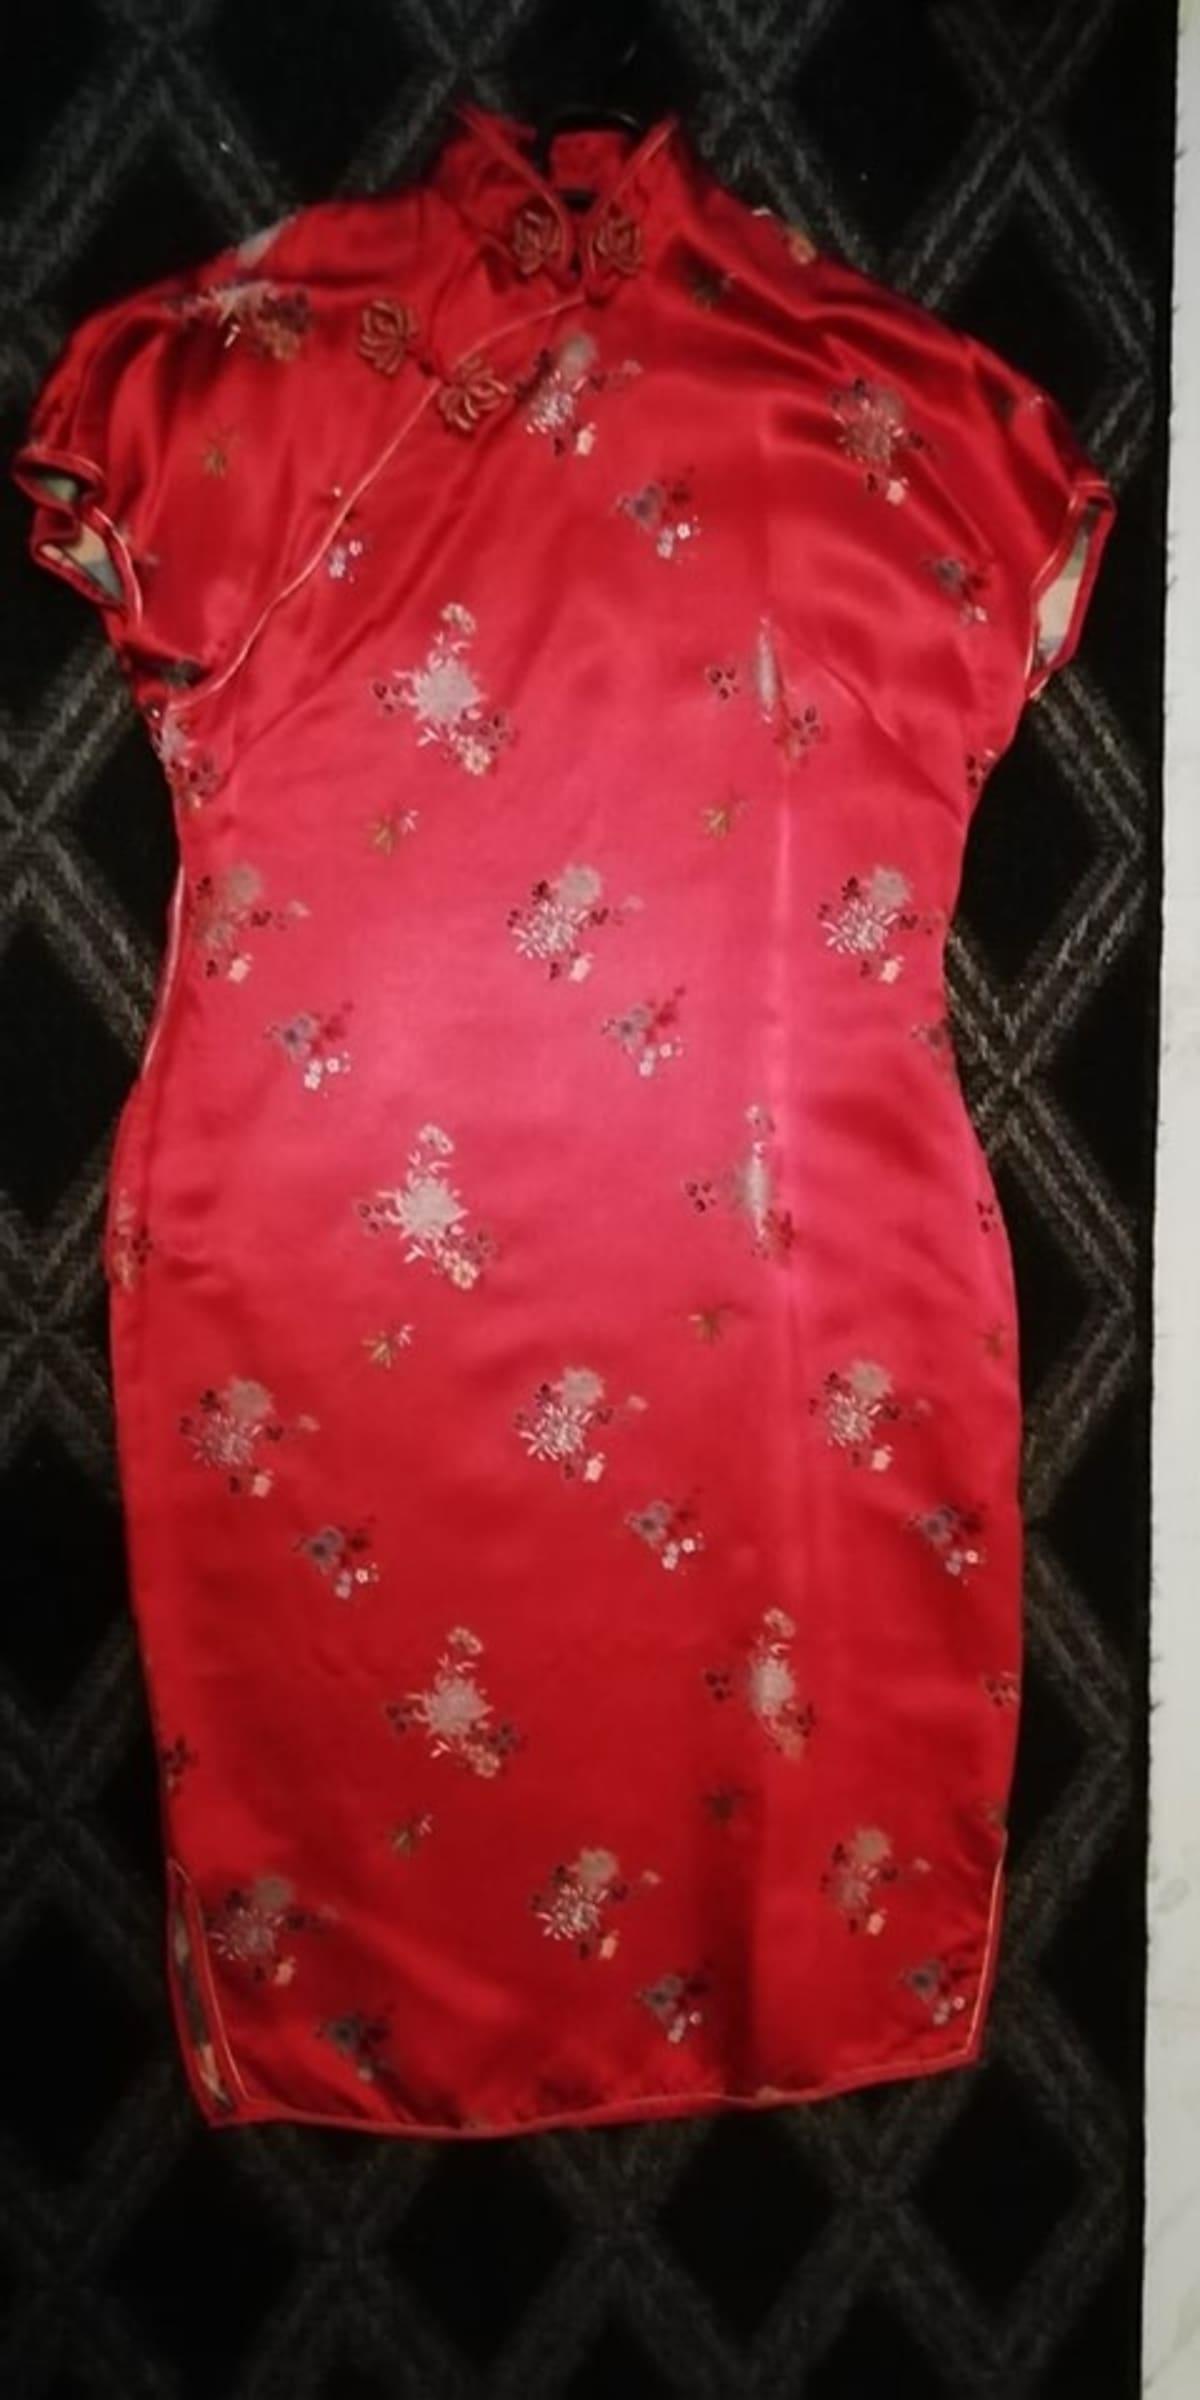 Vaateaarre kiinalainen qipao mekko.